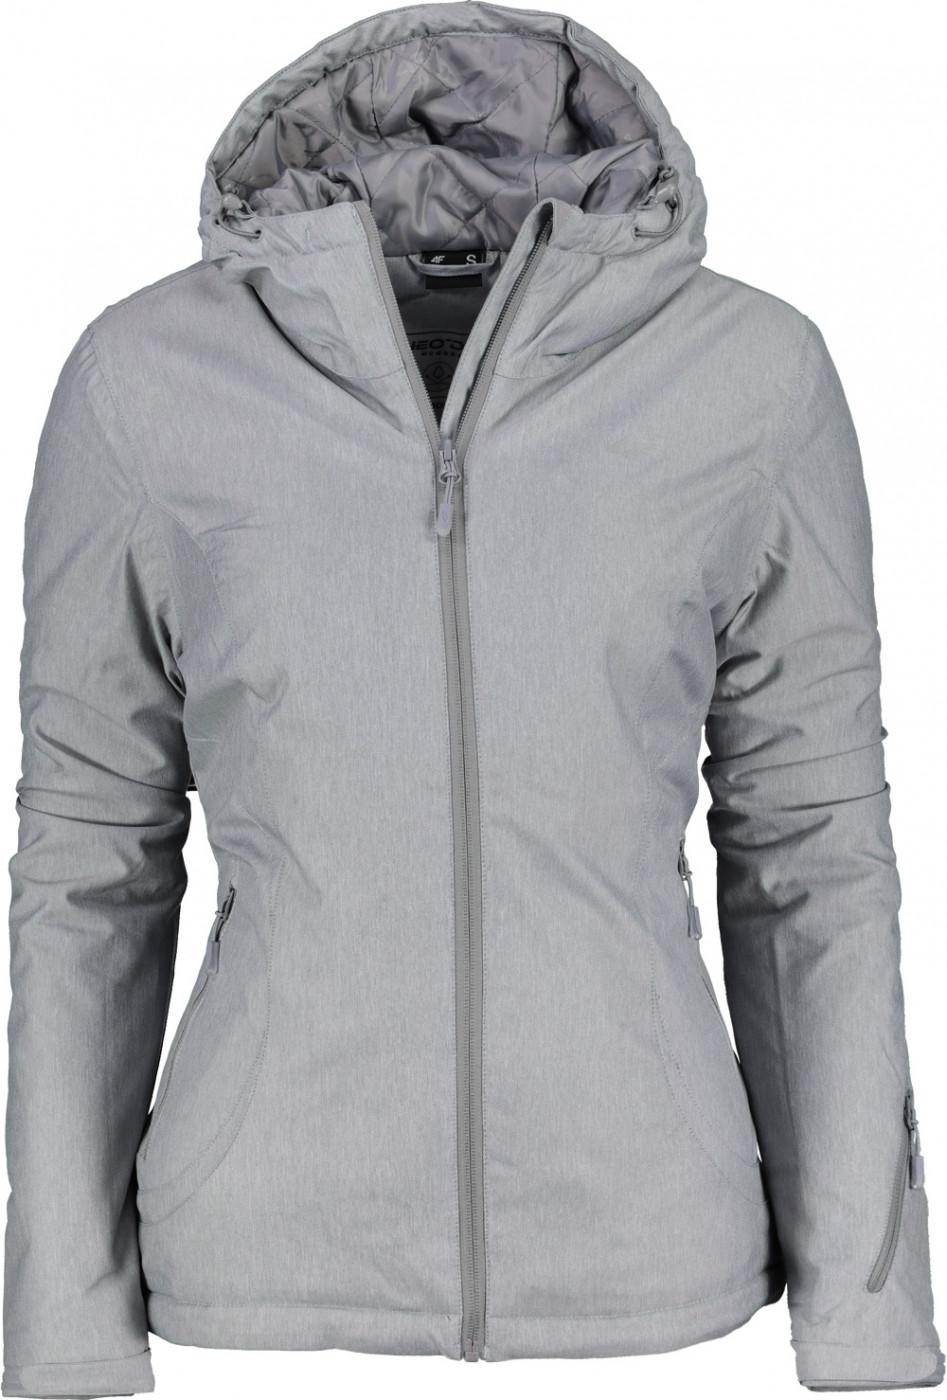 Women's ski jacket 4F KUDN300